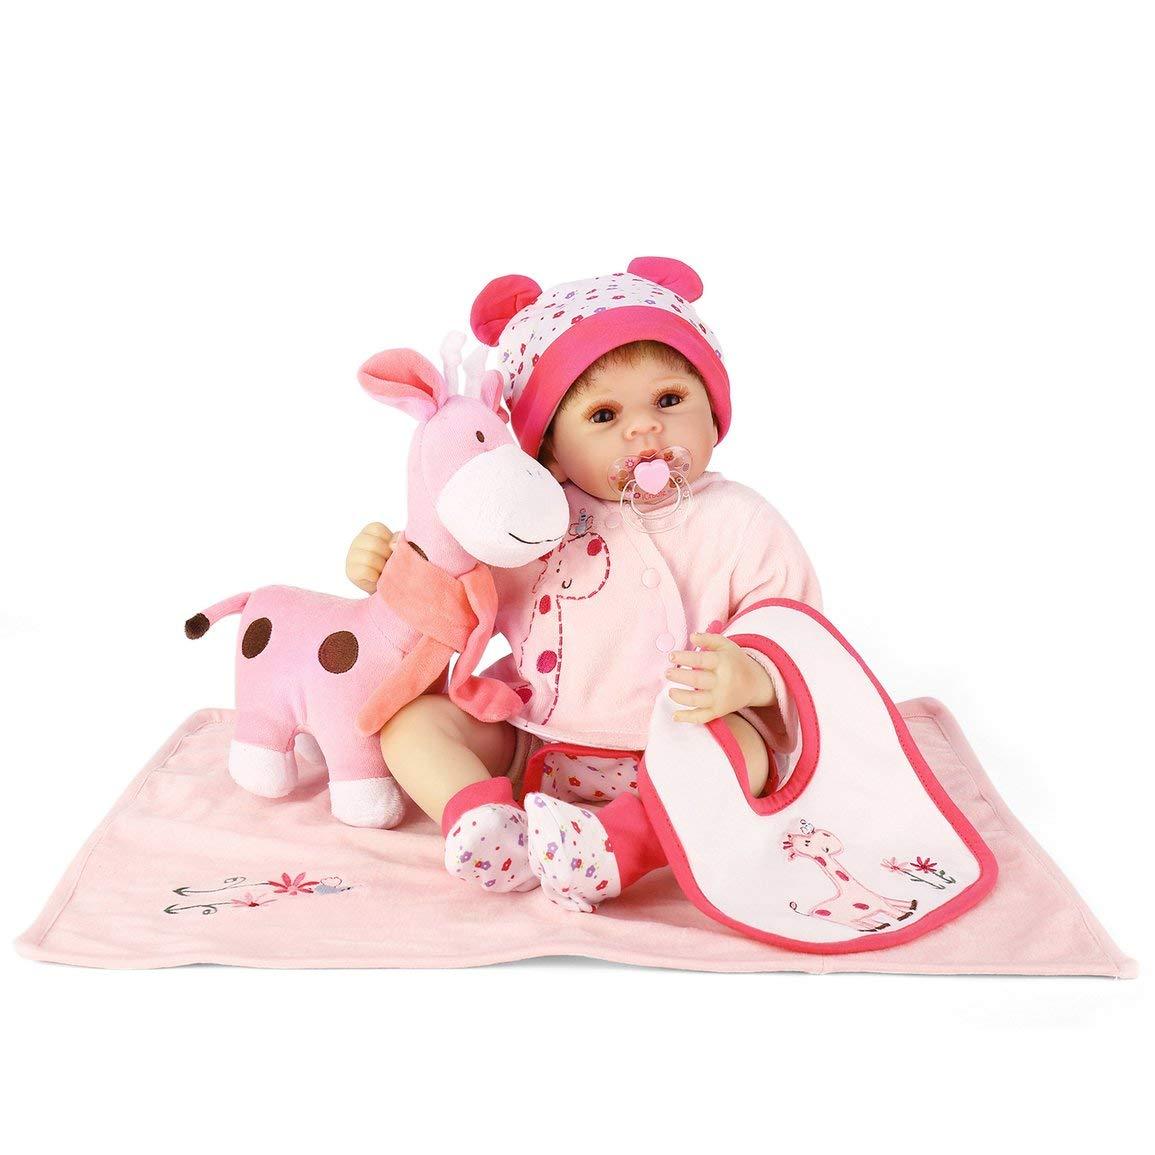 Fantasyworld NPK NPK NPK Simulation Säuglingsbaby 50cm Silikon-Puppe Nette Naturgetreue Neugeborene Puppe Parenting Spielzeug Kreative Geschenk für Kinder Playmate f483f5